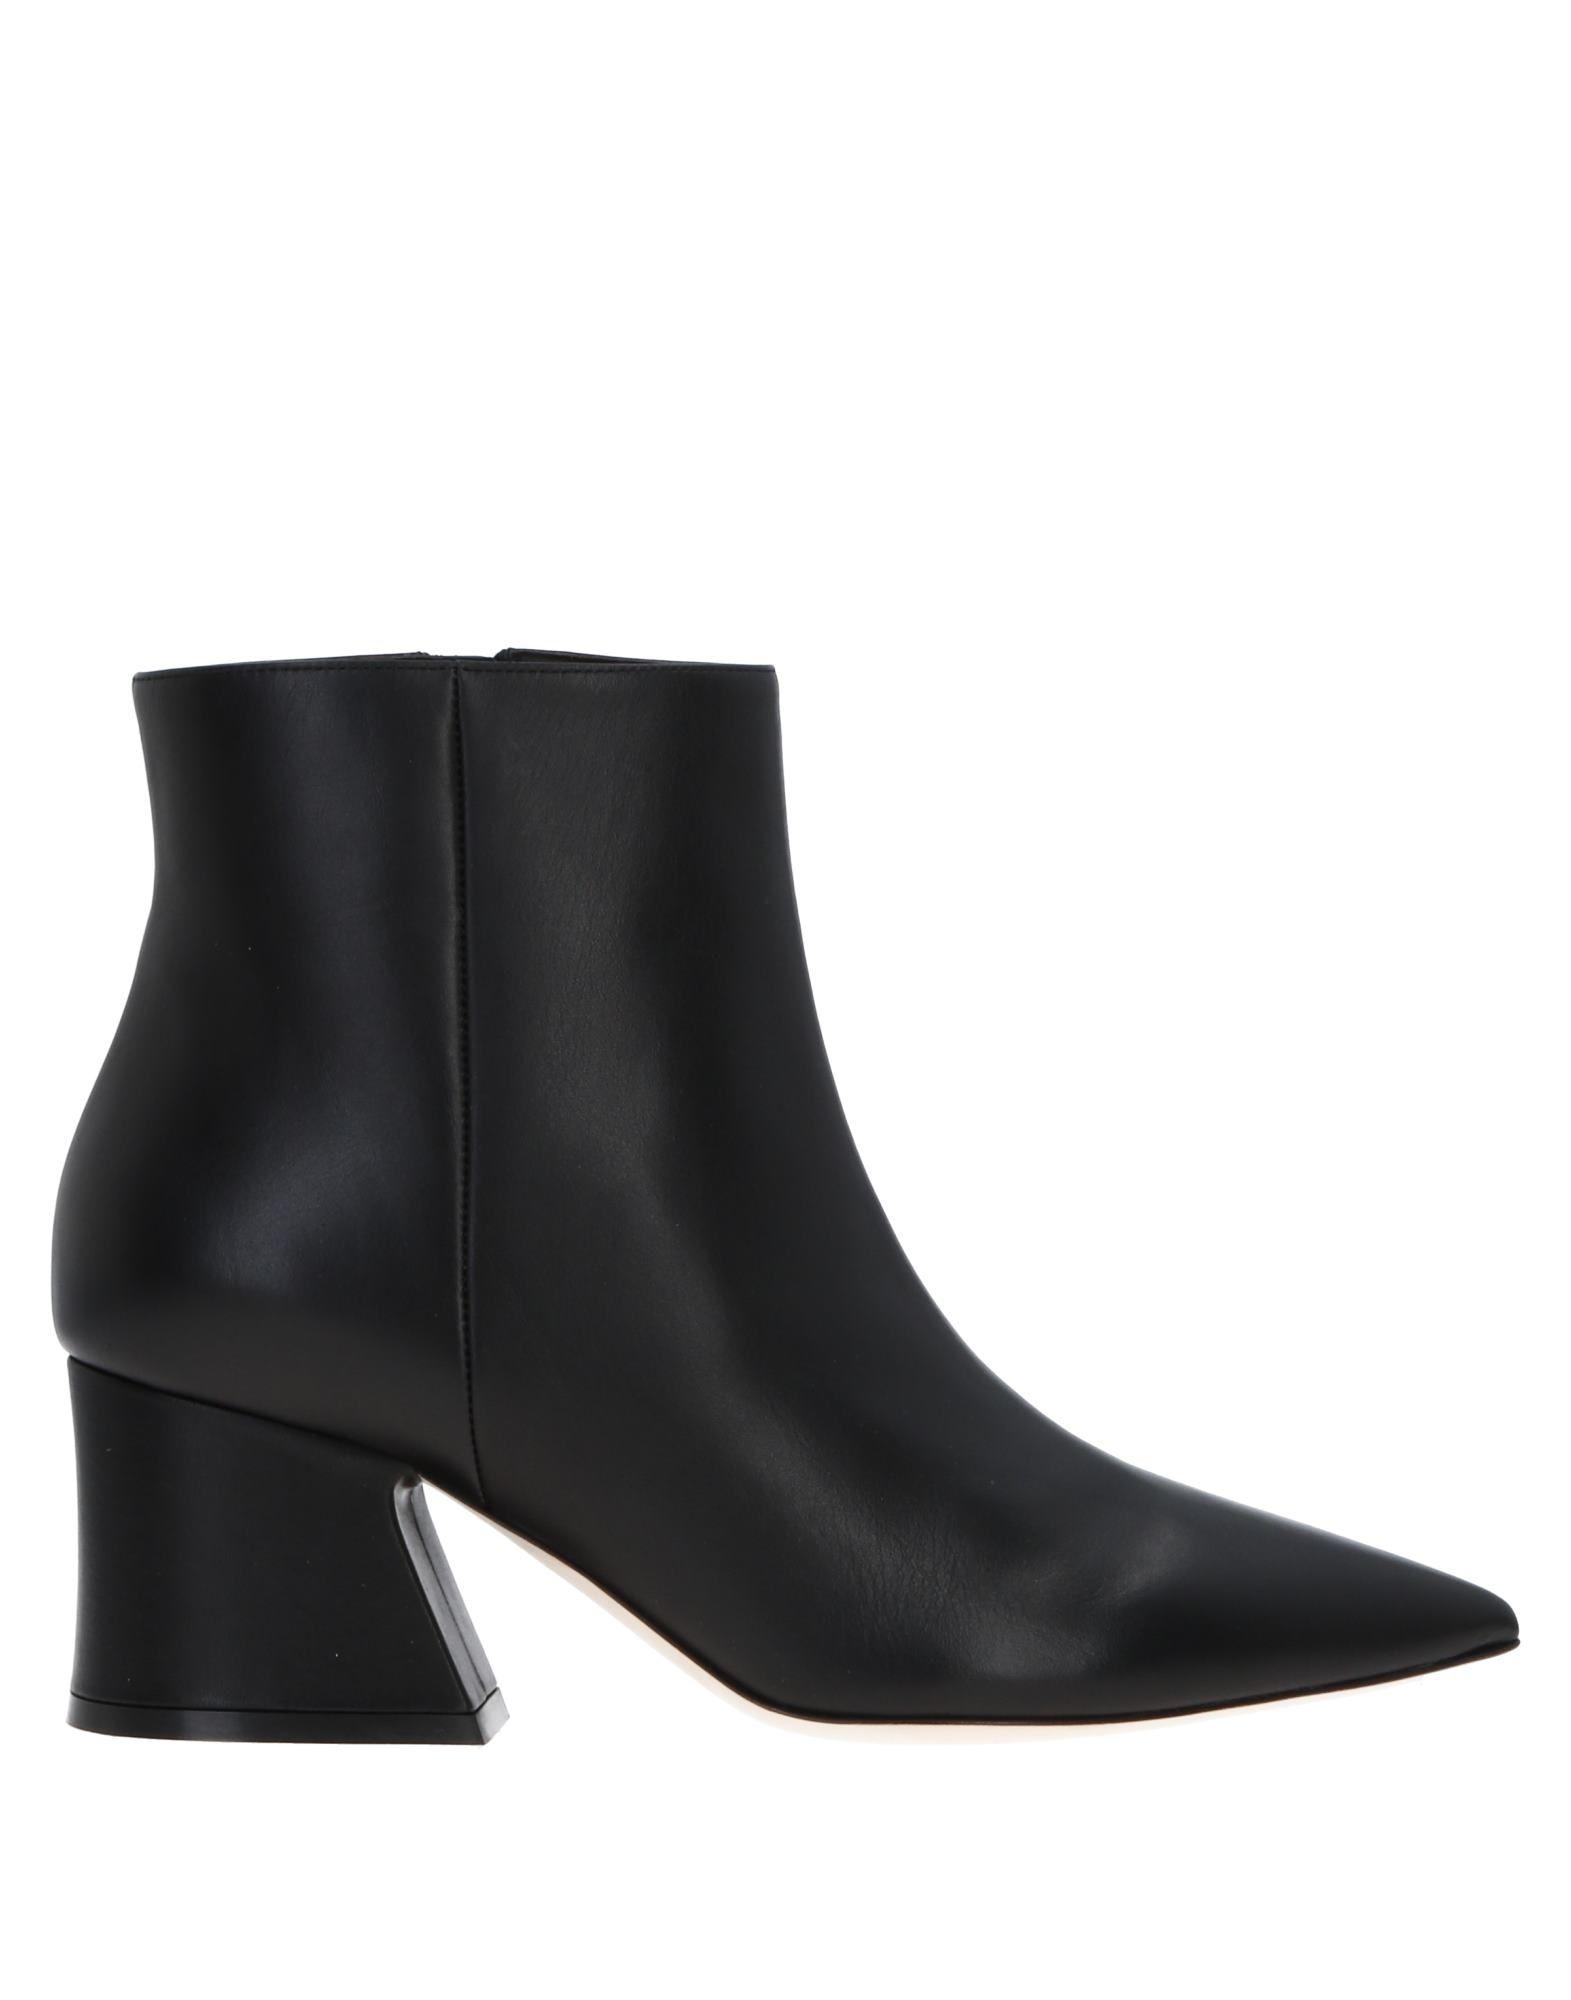 Bottine Lerre Femme - Bottines Lerre Noir Chaussures femme pas cher homme et femme